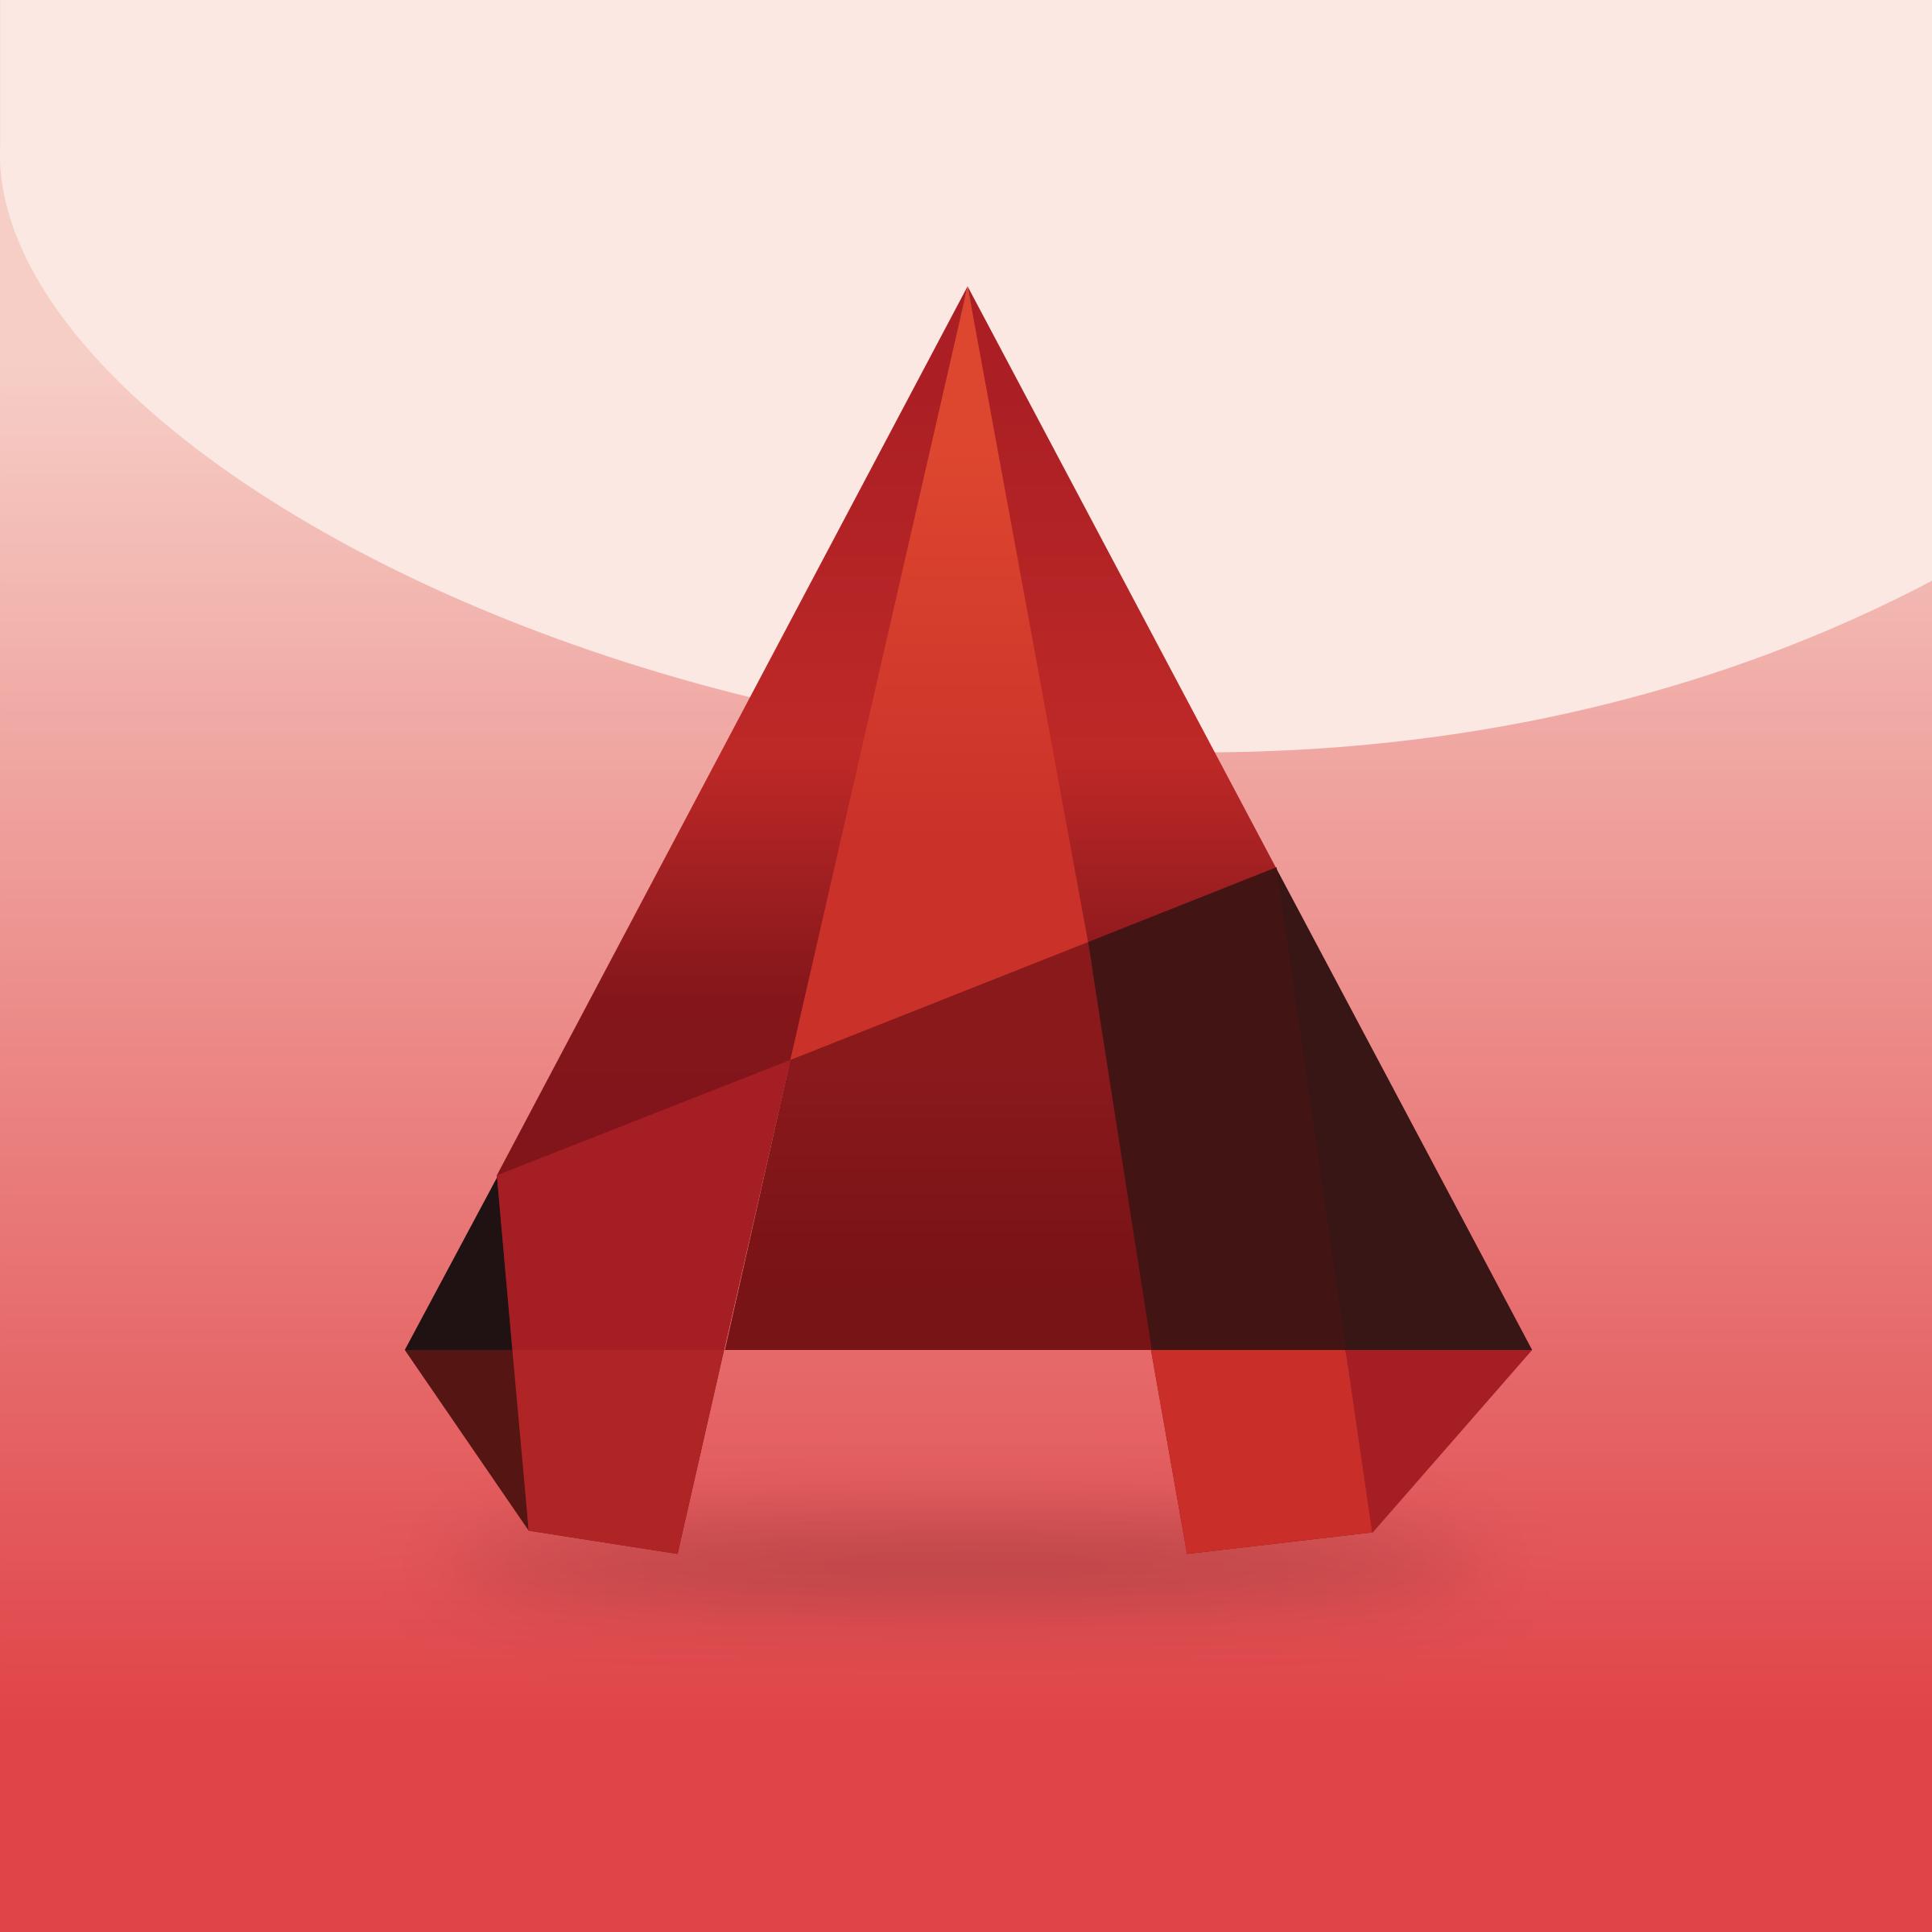 Autocad 2016 Icon Logo Png Tr